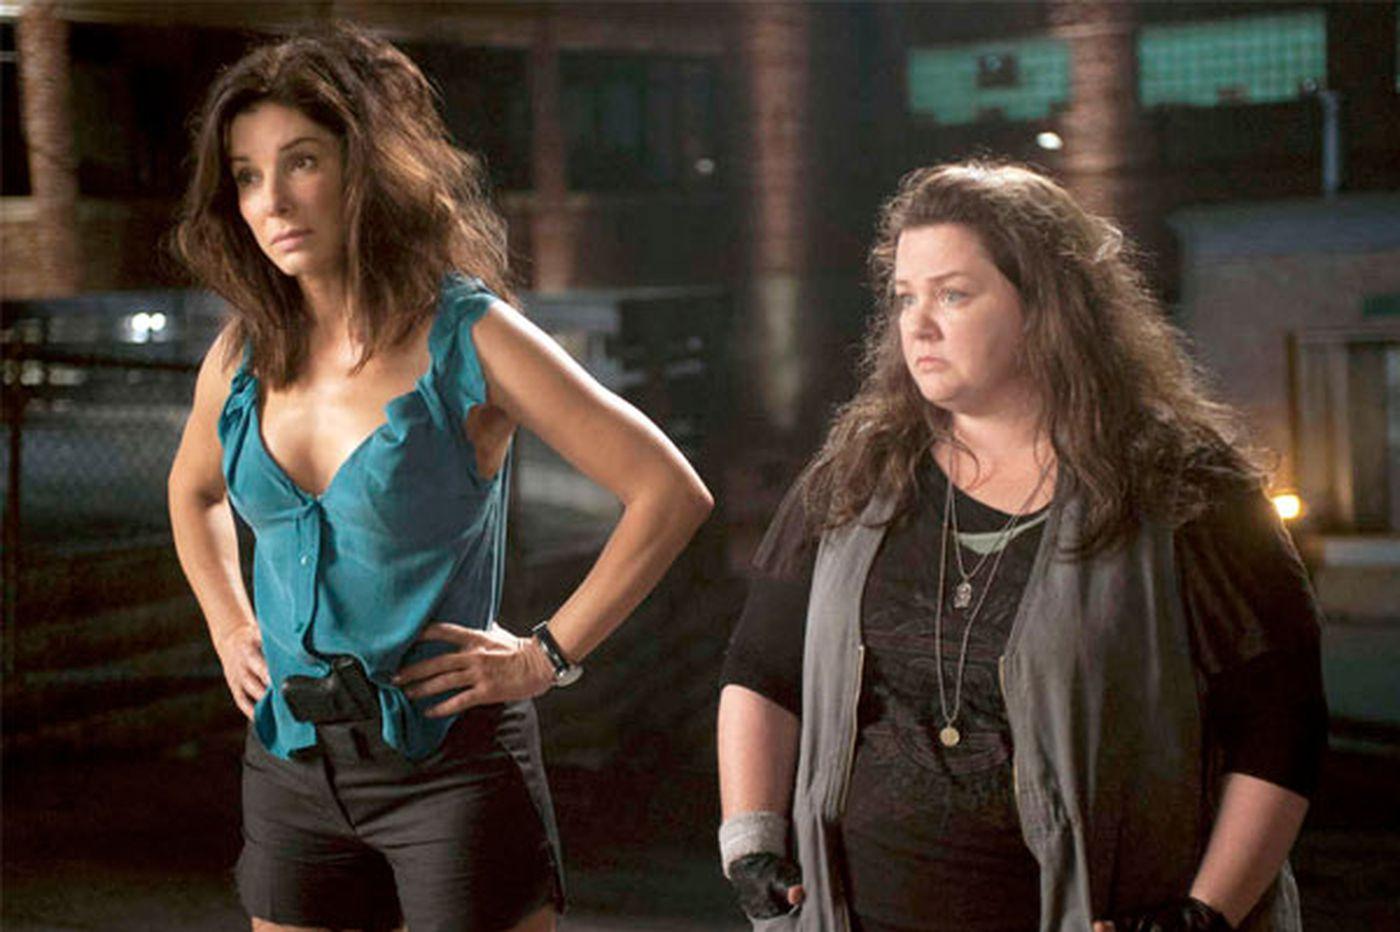 Buddy comedy raises the heat for Melissa McCarthy